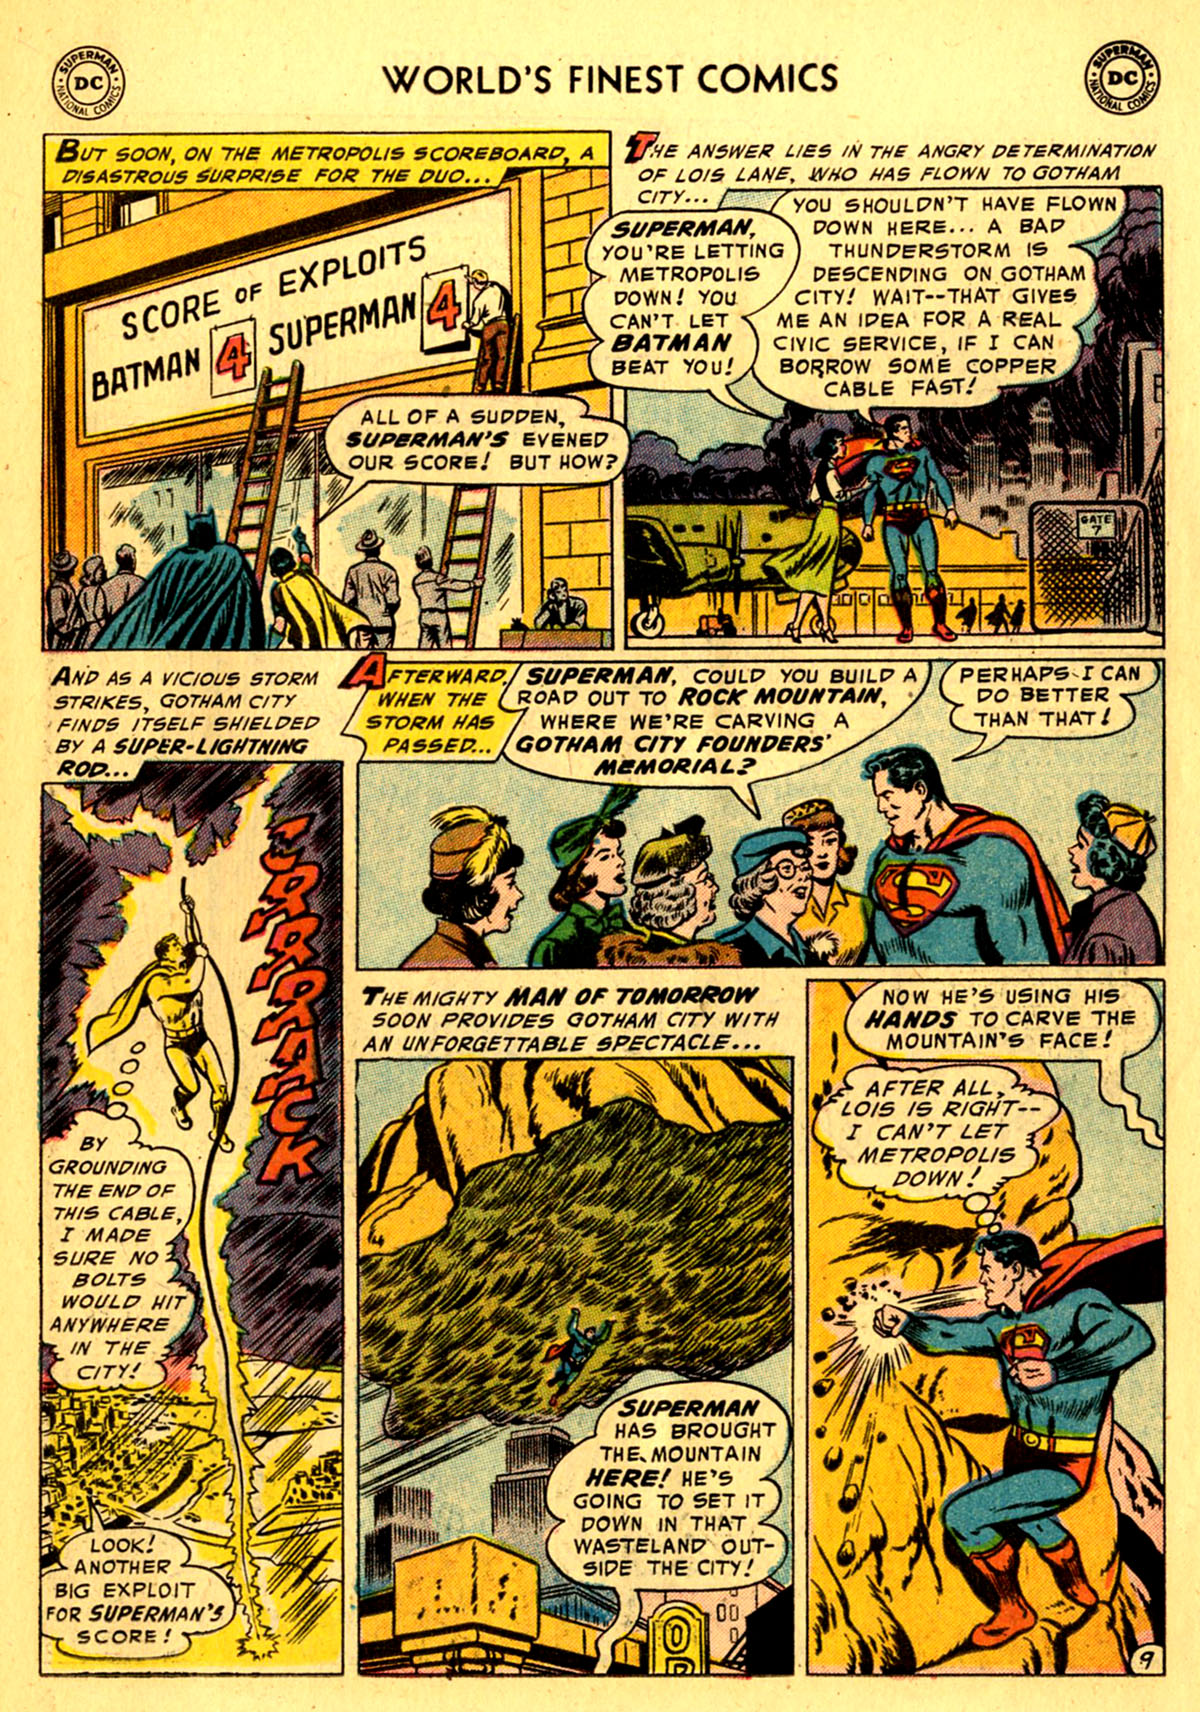 Read online World's Finest Comics comic -  Issue #76 - 11